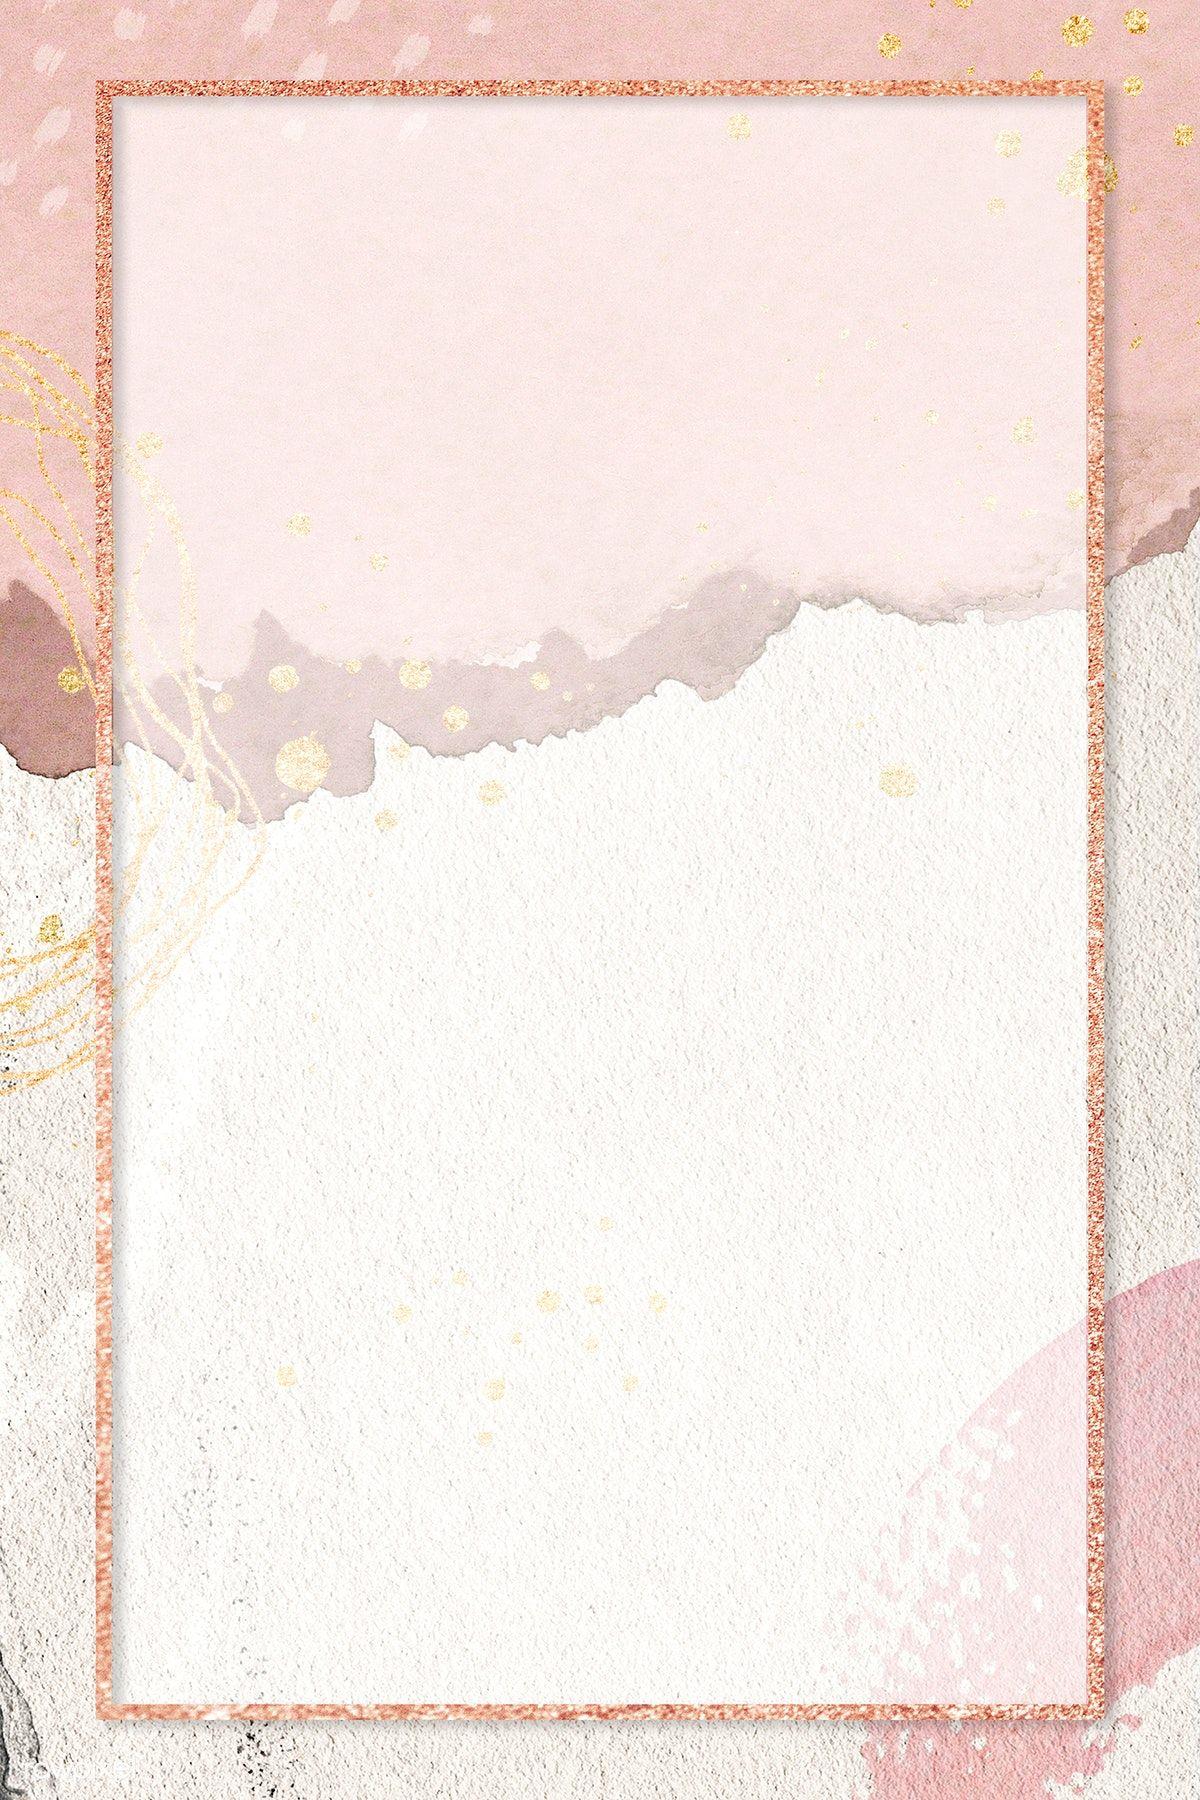 Rectangle Frame On Neo Memphis Social Background Illustration Free Image By Rawpixel Com Hwangm Vector Background Pattern Free Illustrations Pink Amaryllis